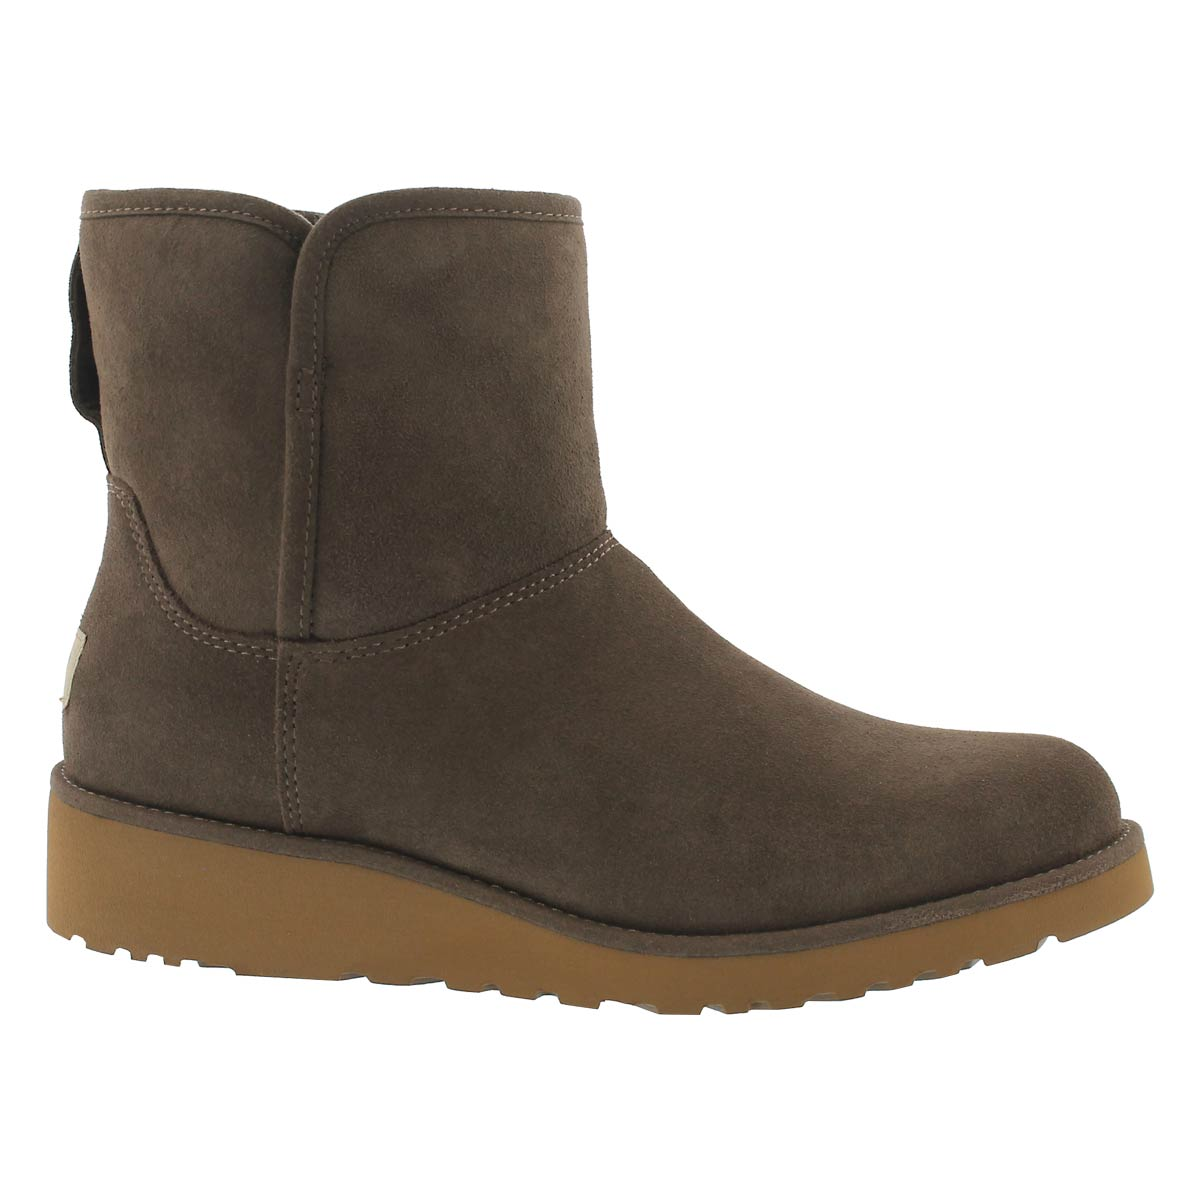 Women's KRISTIN slate wedge sheepskin boots